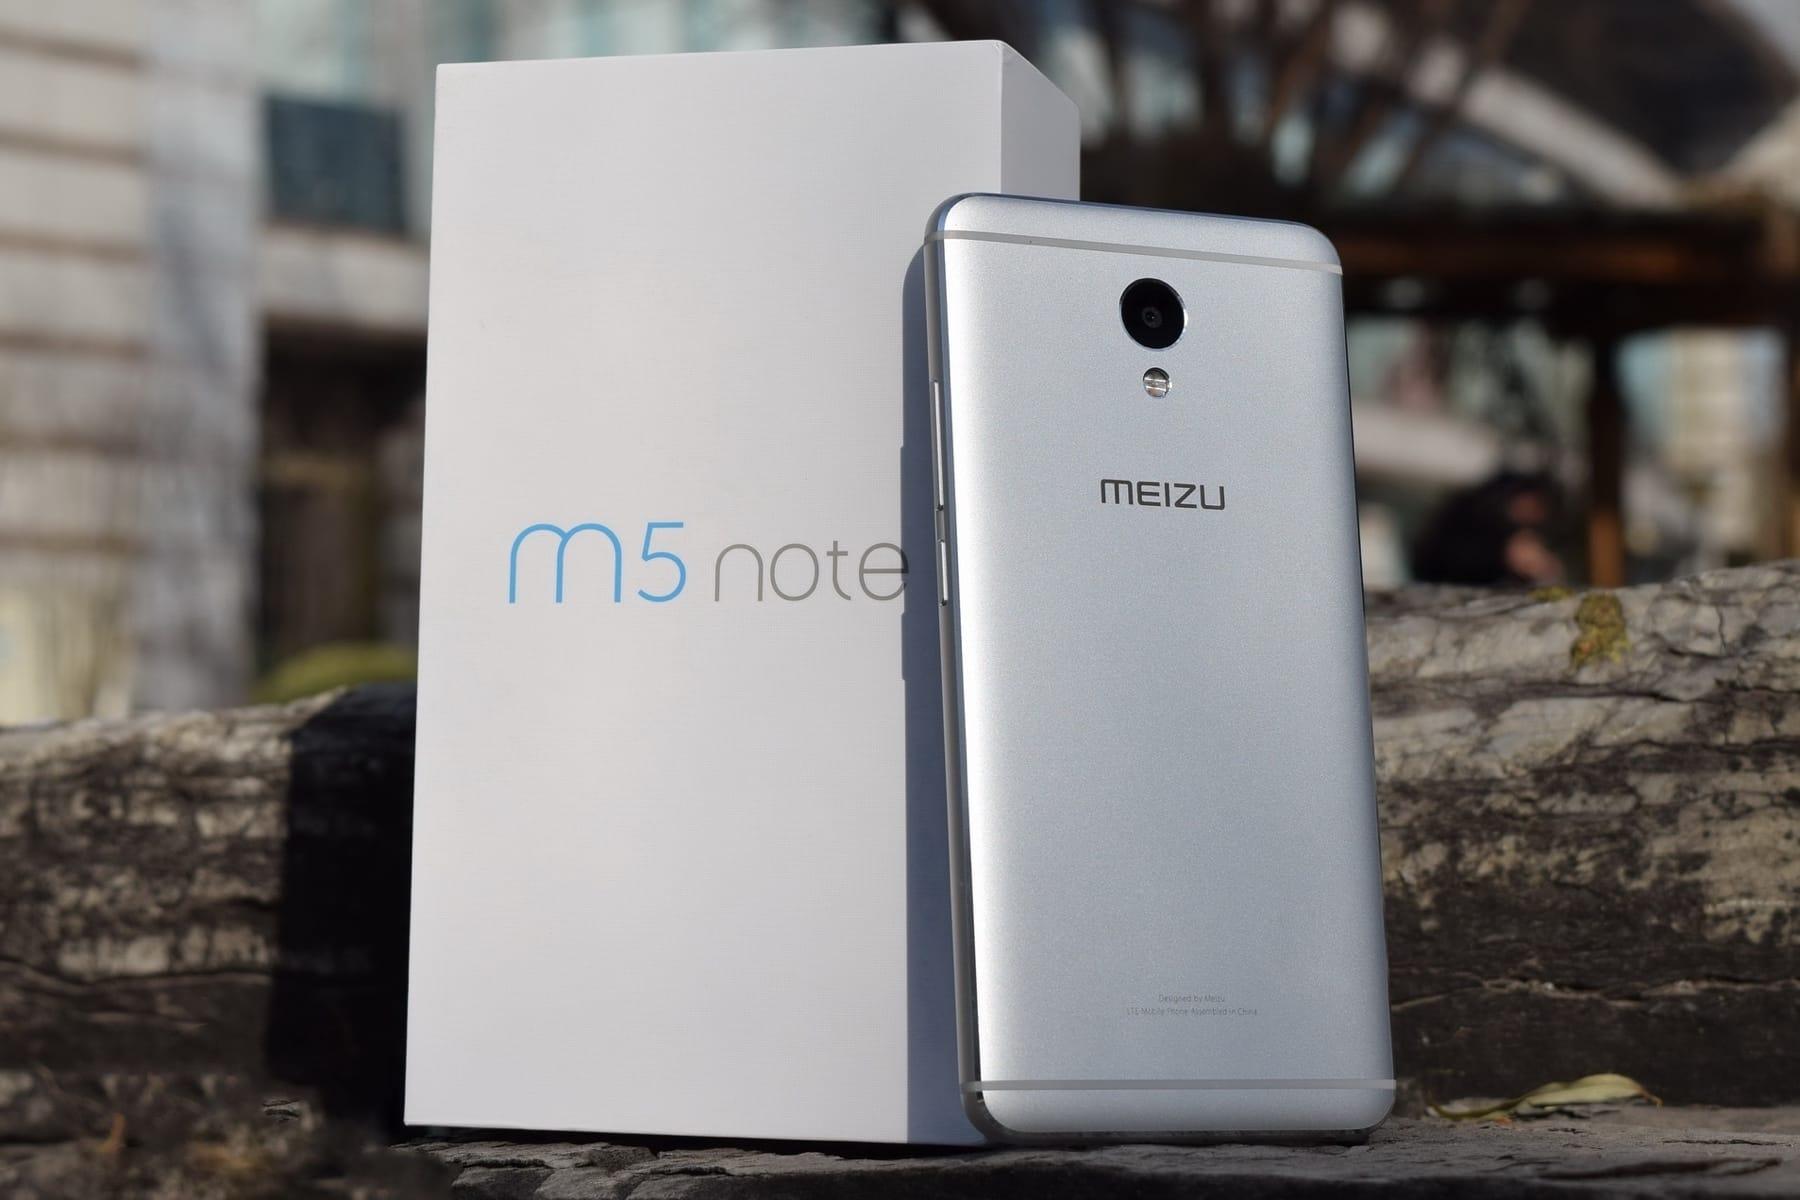 Цена телефона Meizu M5 Note резко упала в РФ